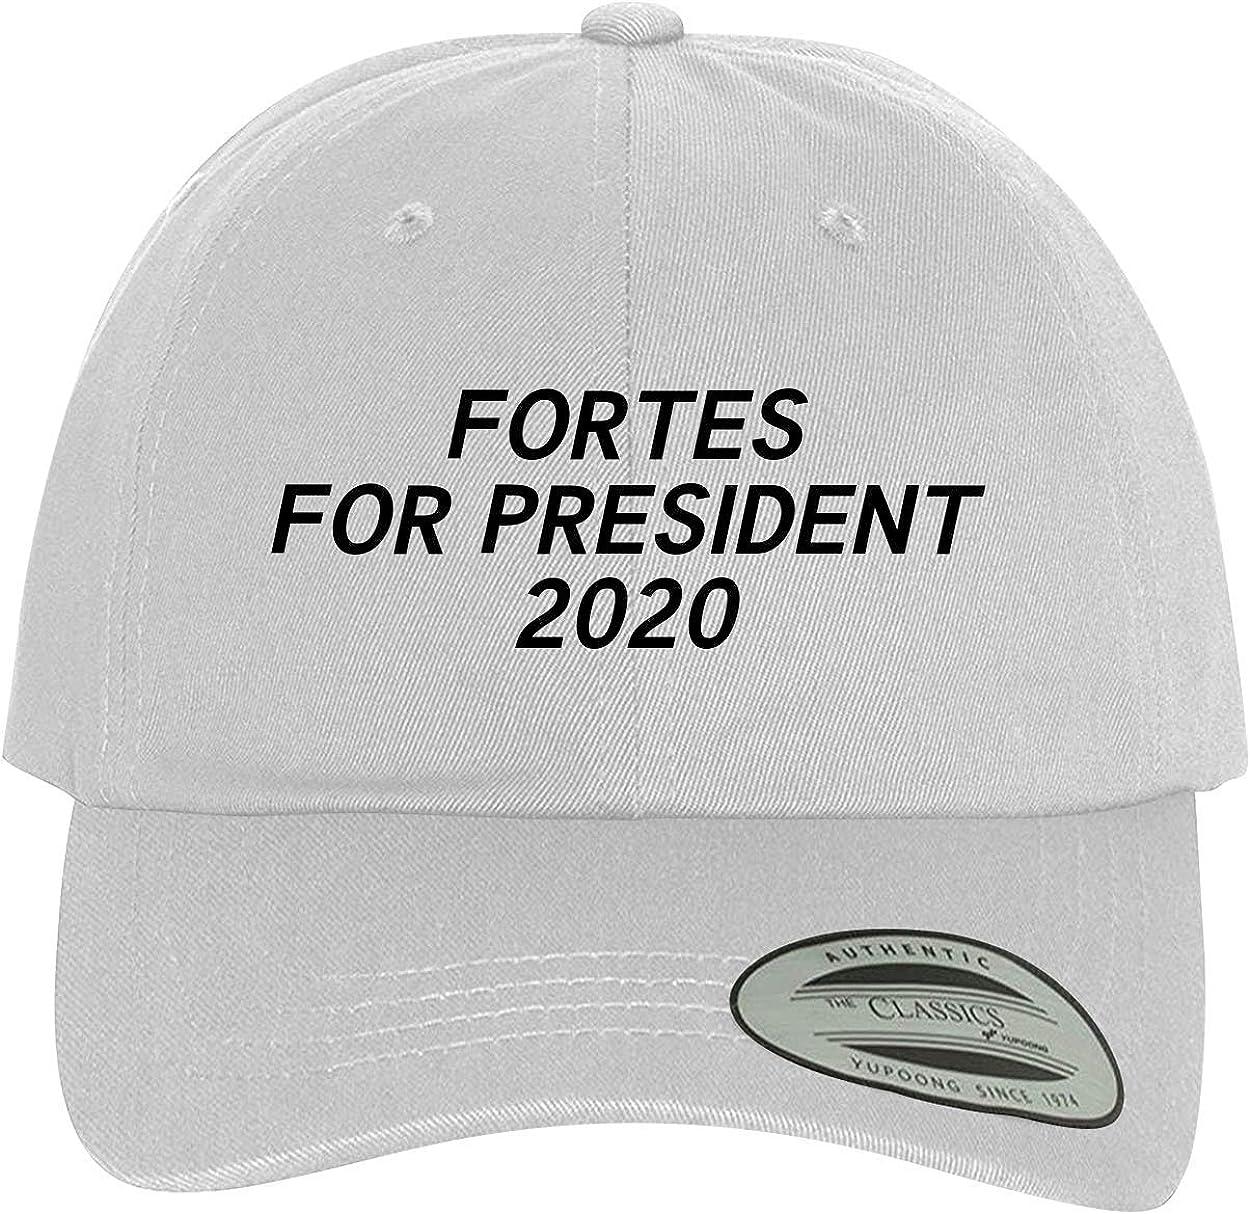 Fortes für President 2020 - Comfortable Papa Hut Baseball Cap